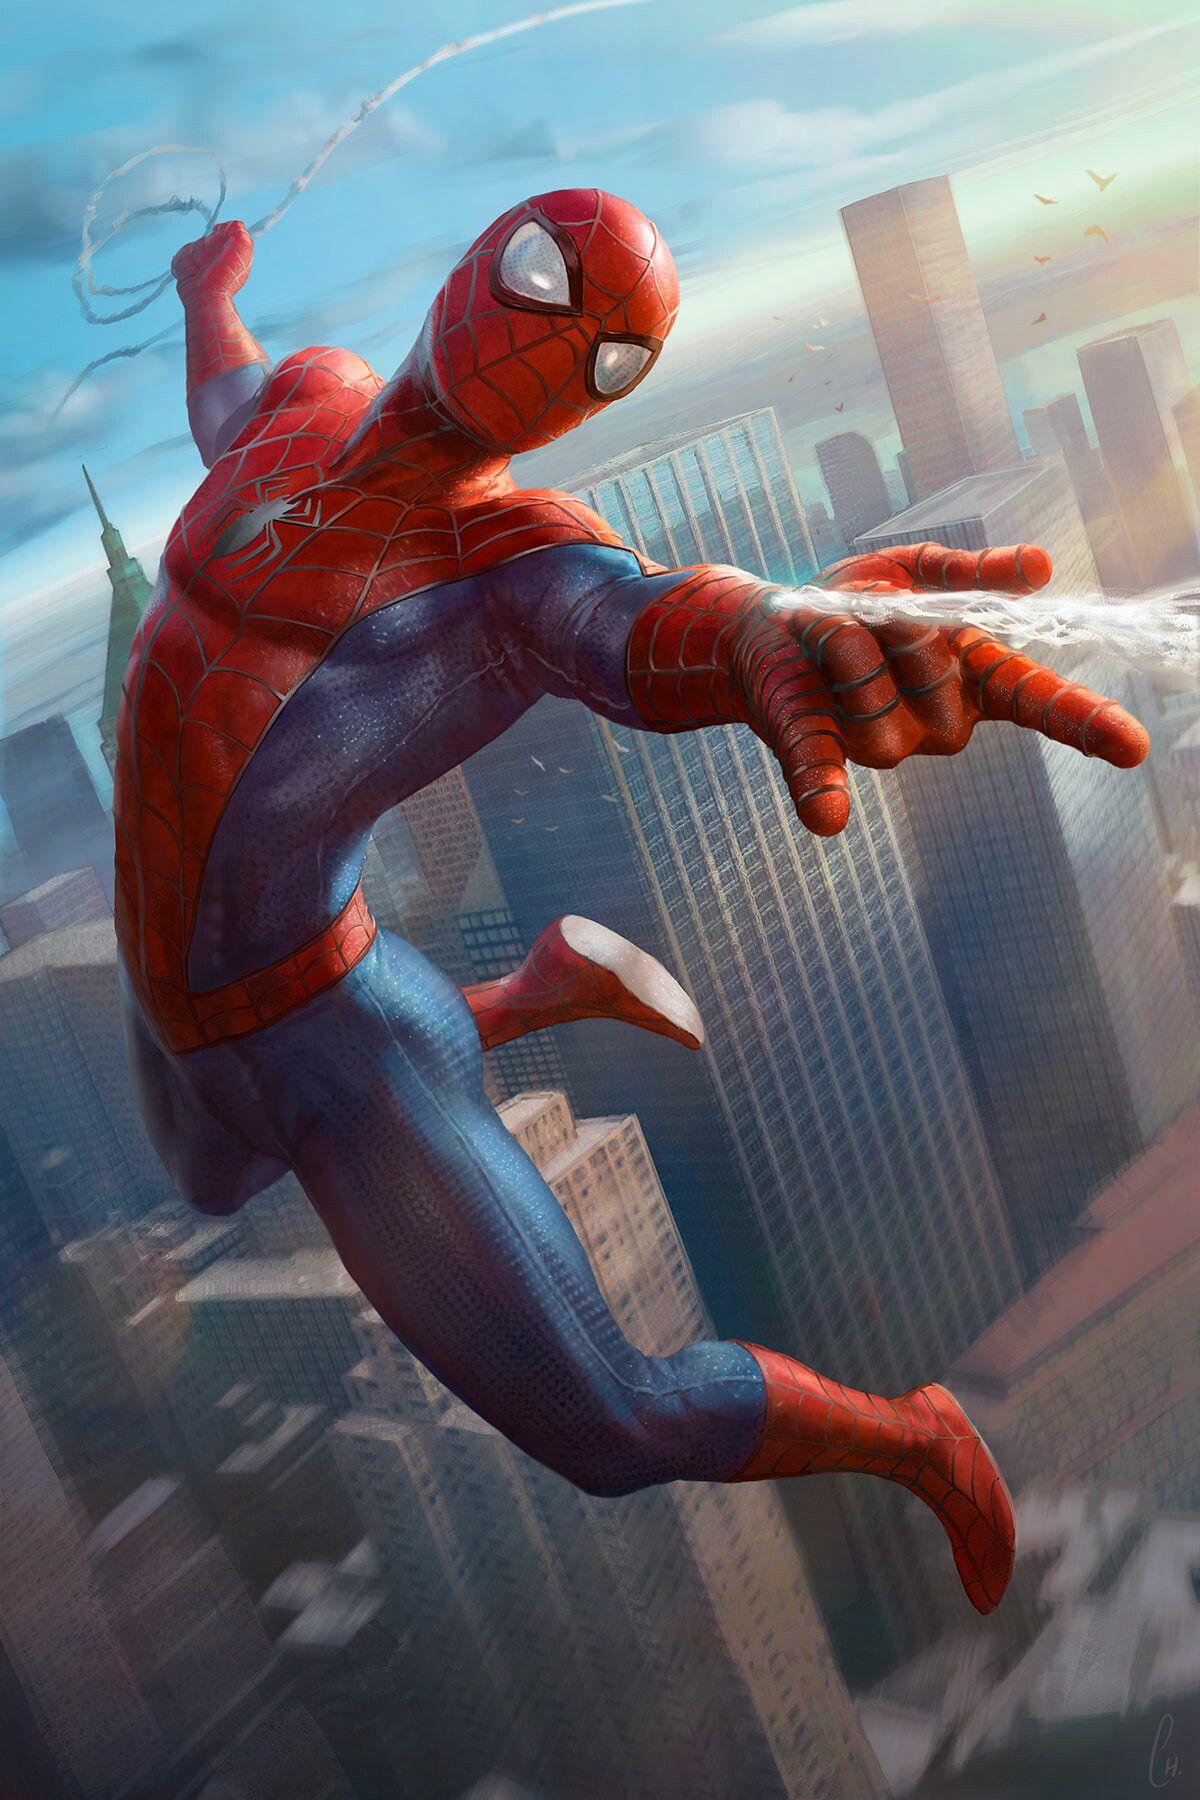 Pin By Cweekscosplay On Marvelifik In 2020 Spiderman Artwork Marvel Superhero Posters Spectacular Spider Man